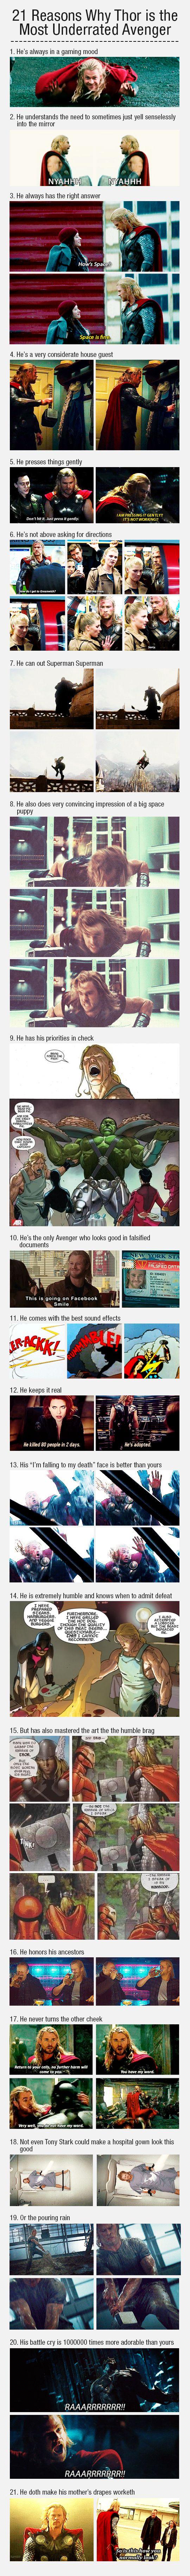 Ya entendí..es un amors ....pero sigo amando a Loki